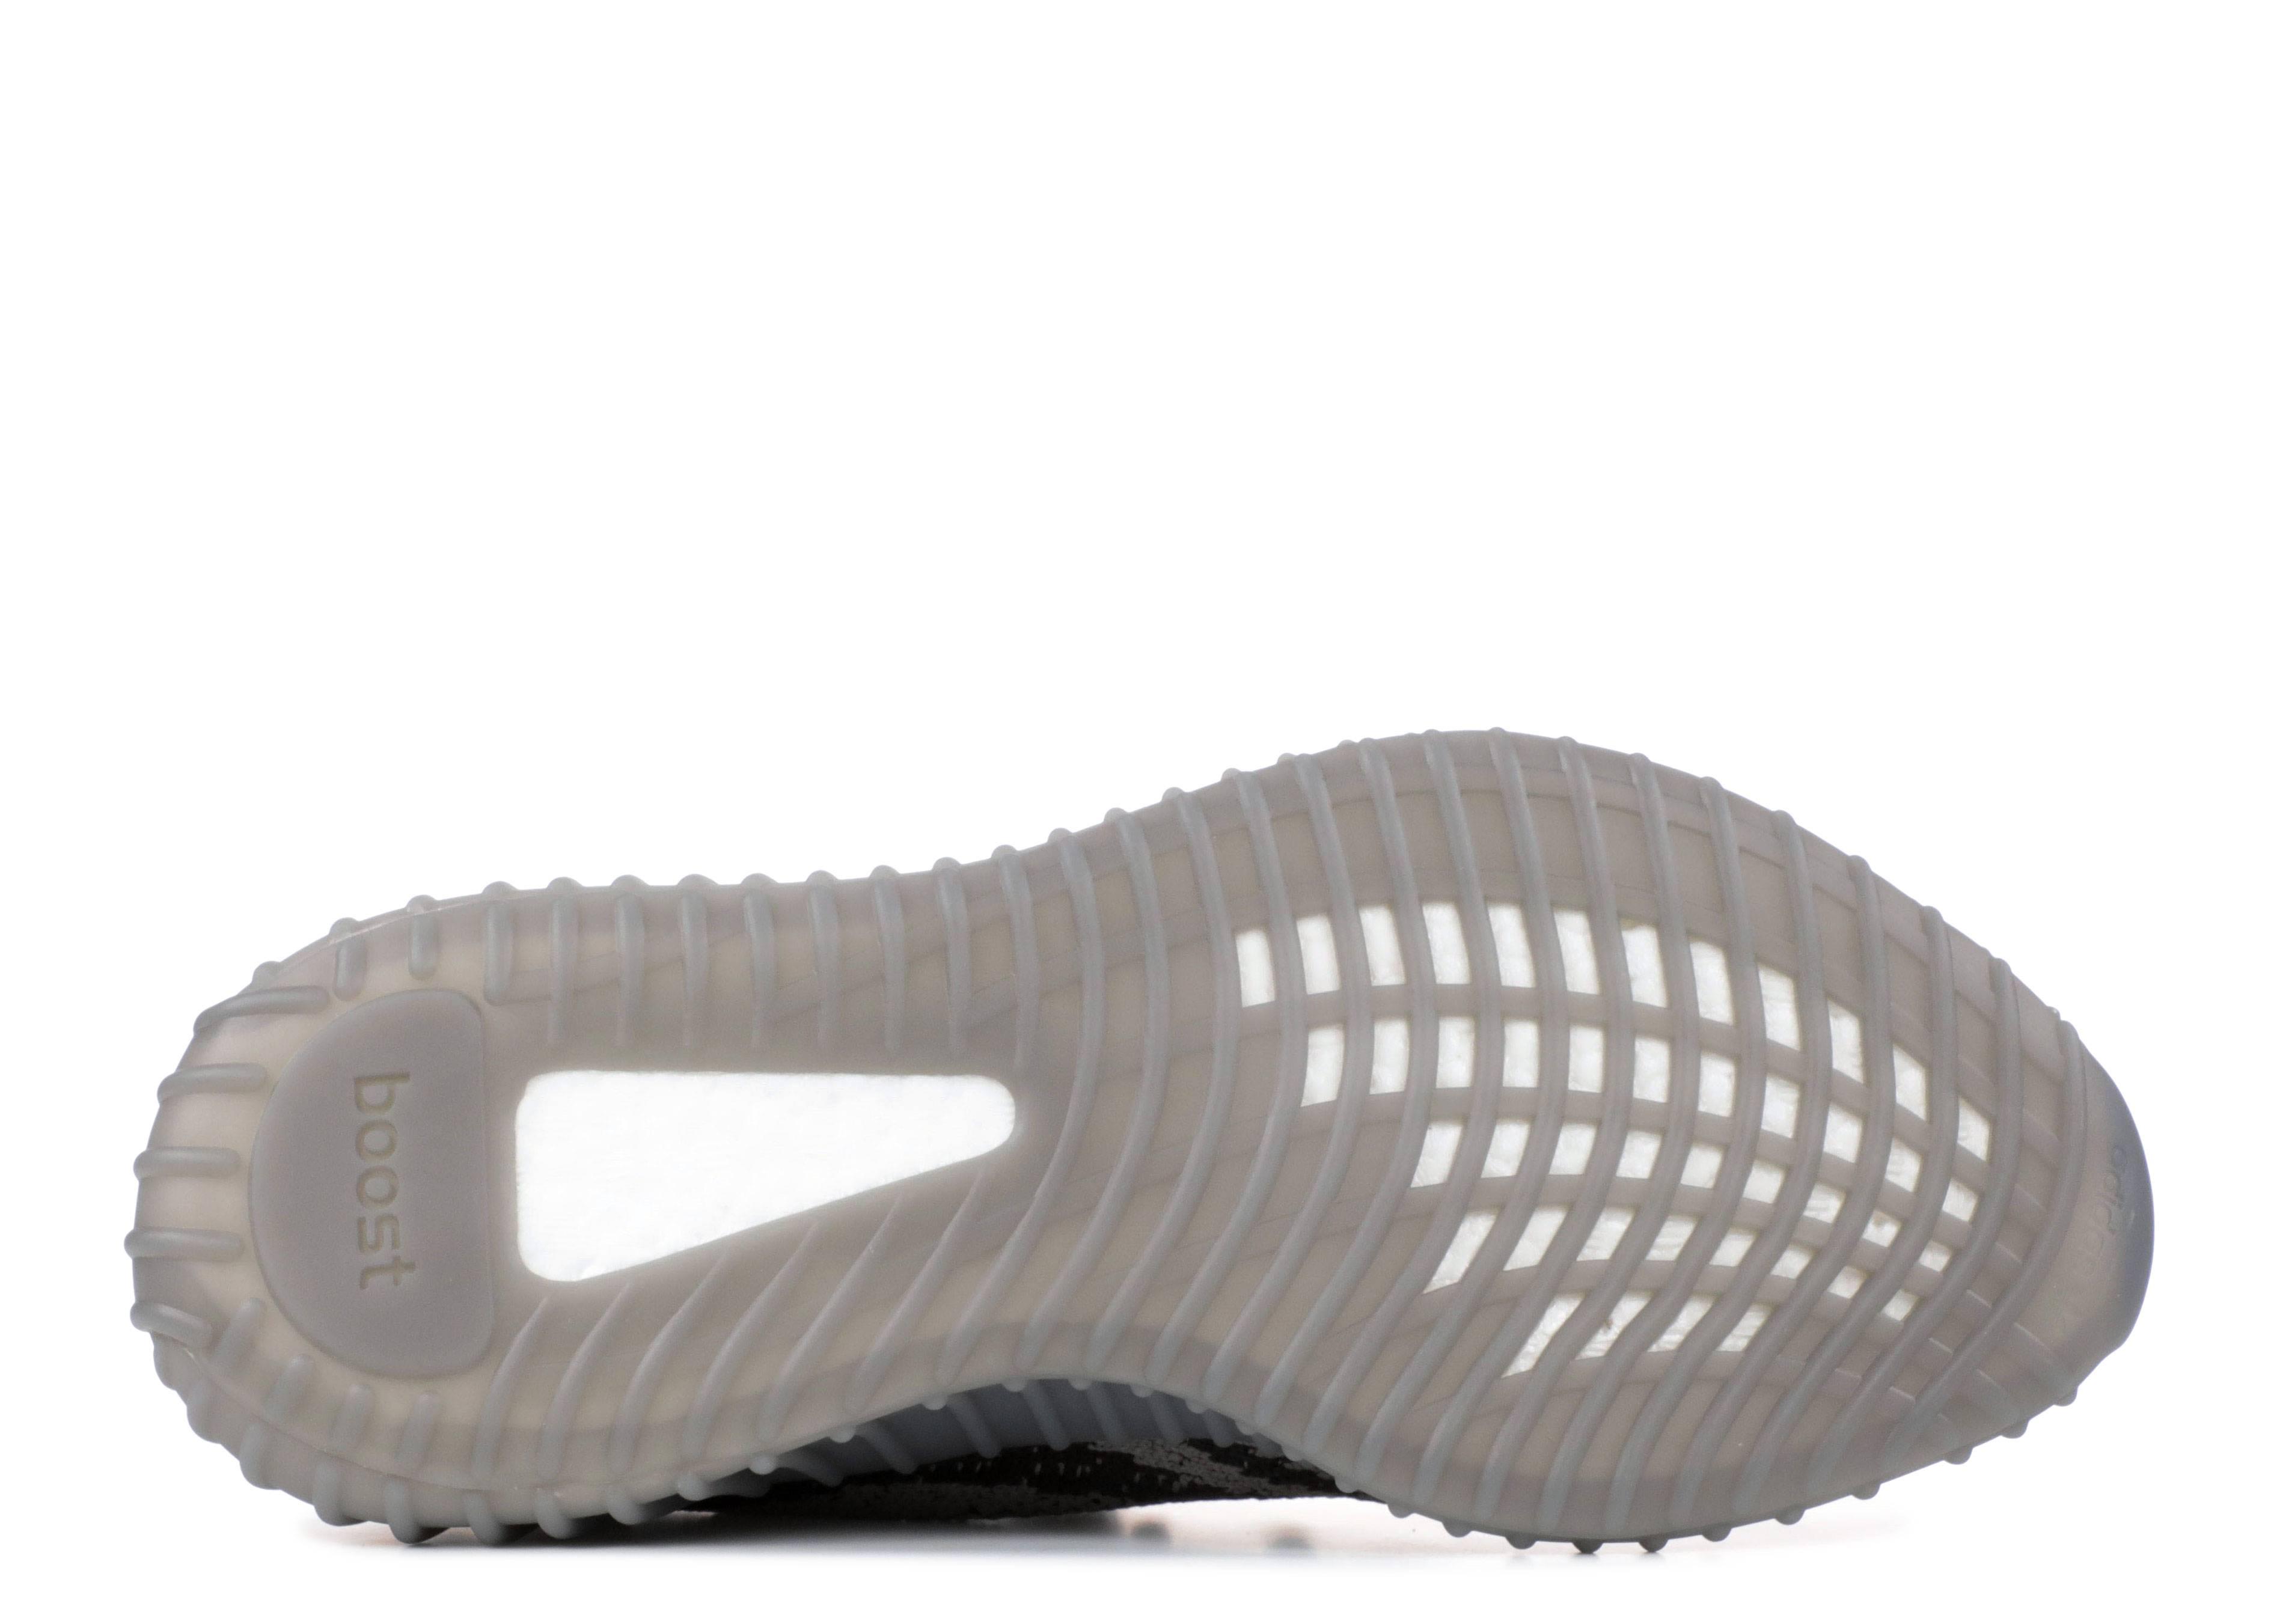 the latest 191ac eafac ... free shipping adidas yeezy boost 350 v2 beluga 090ec f4883